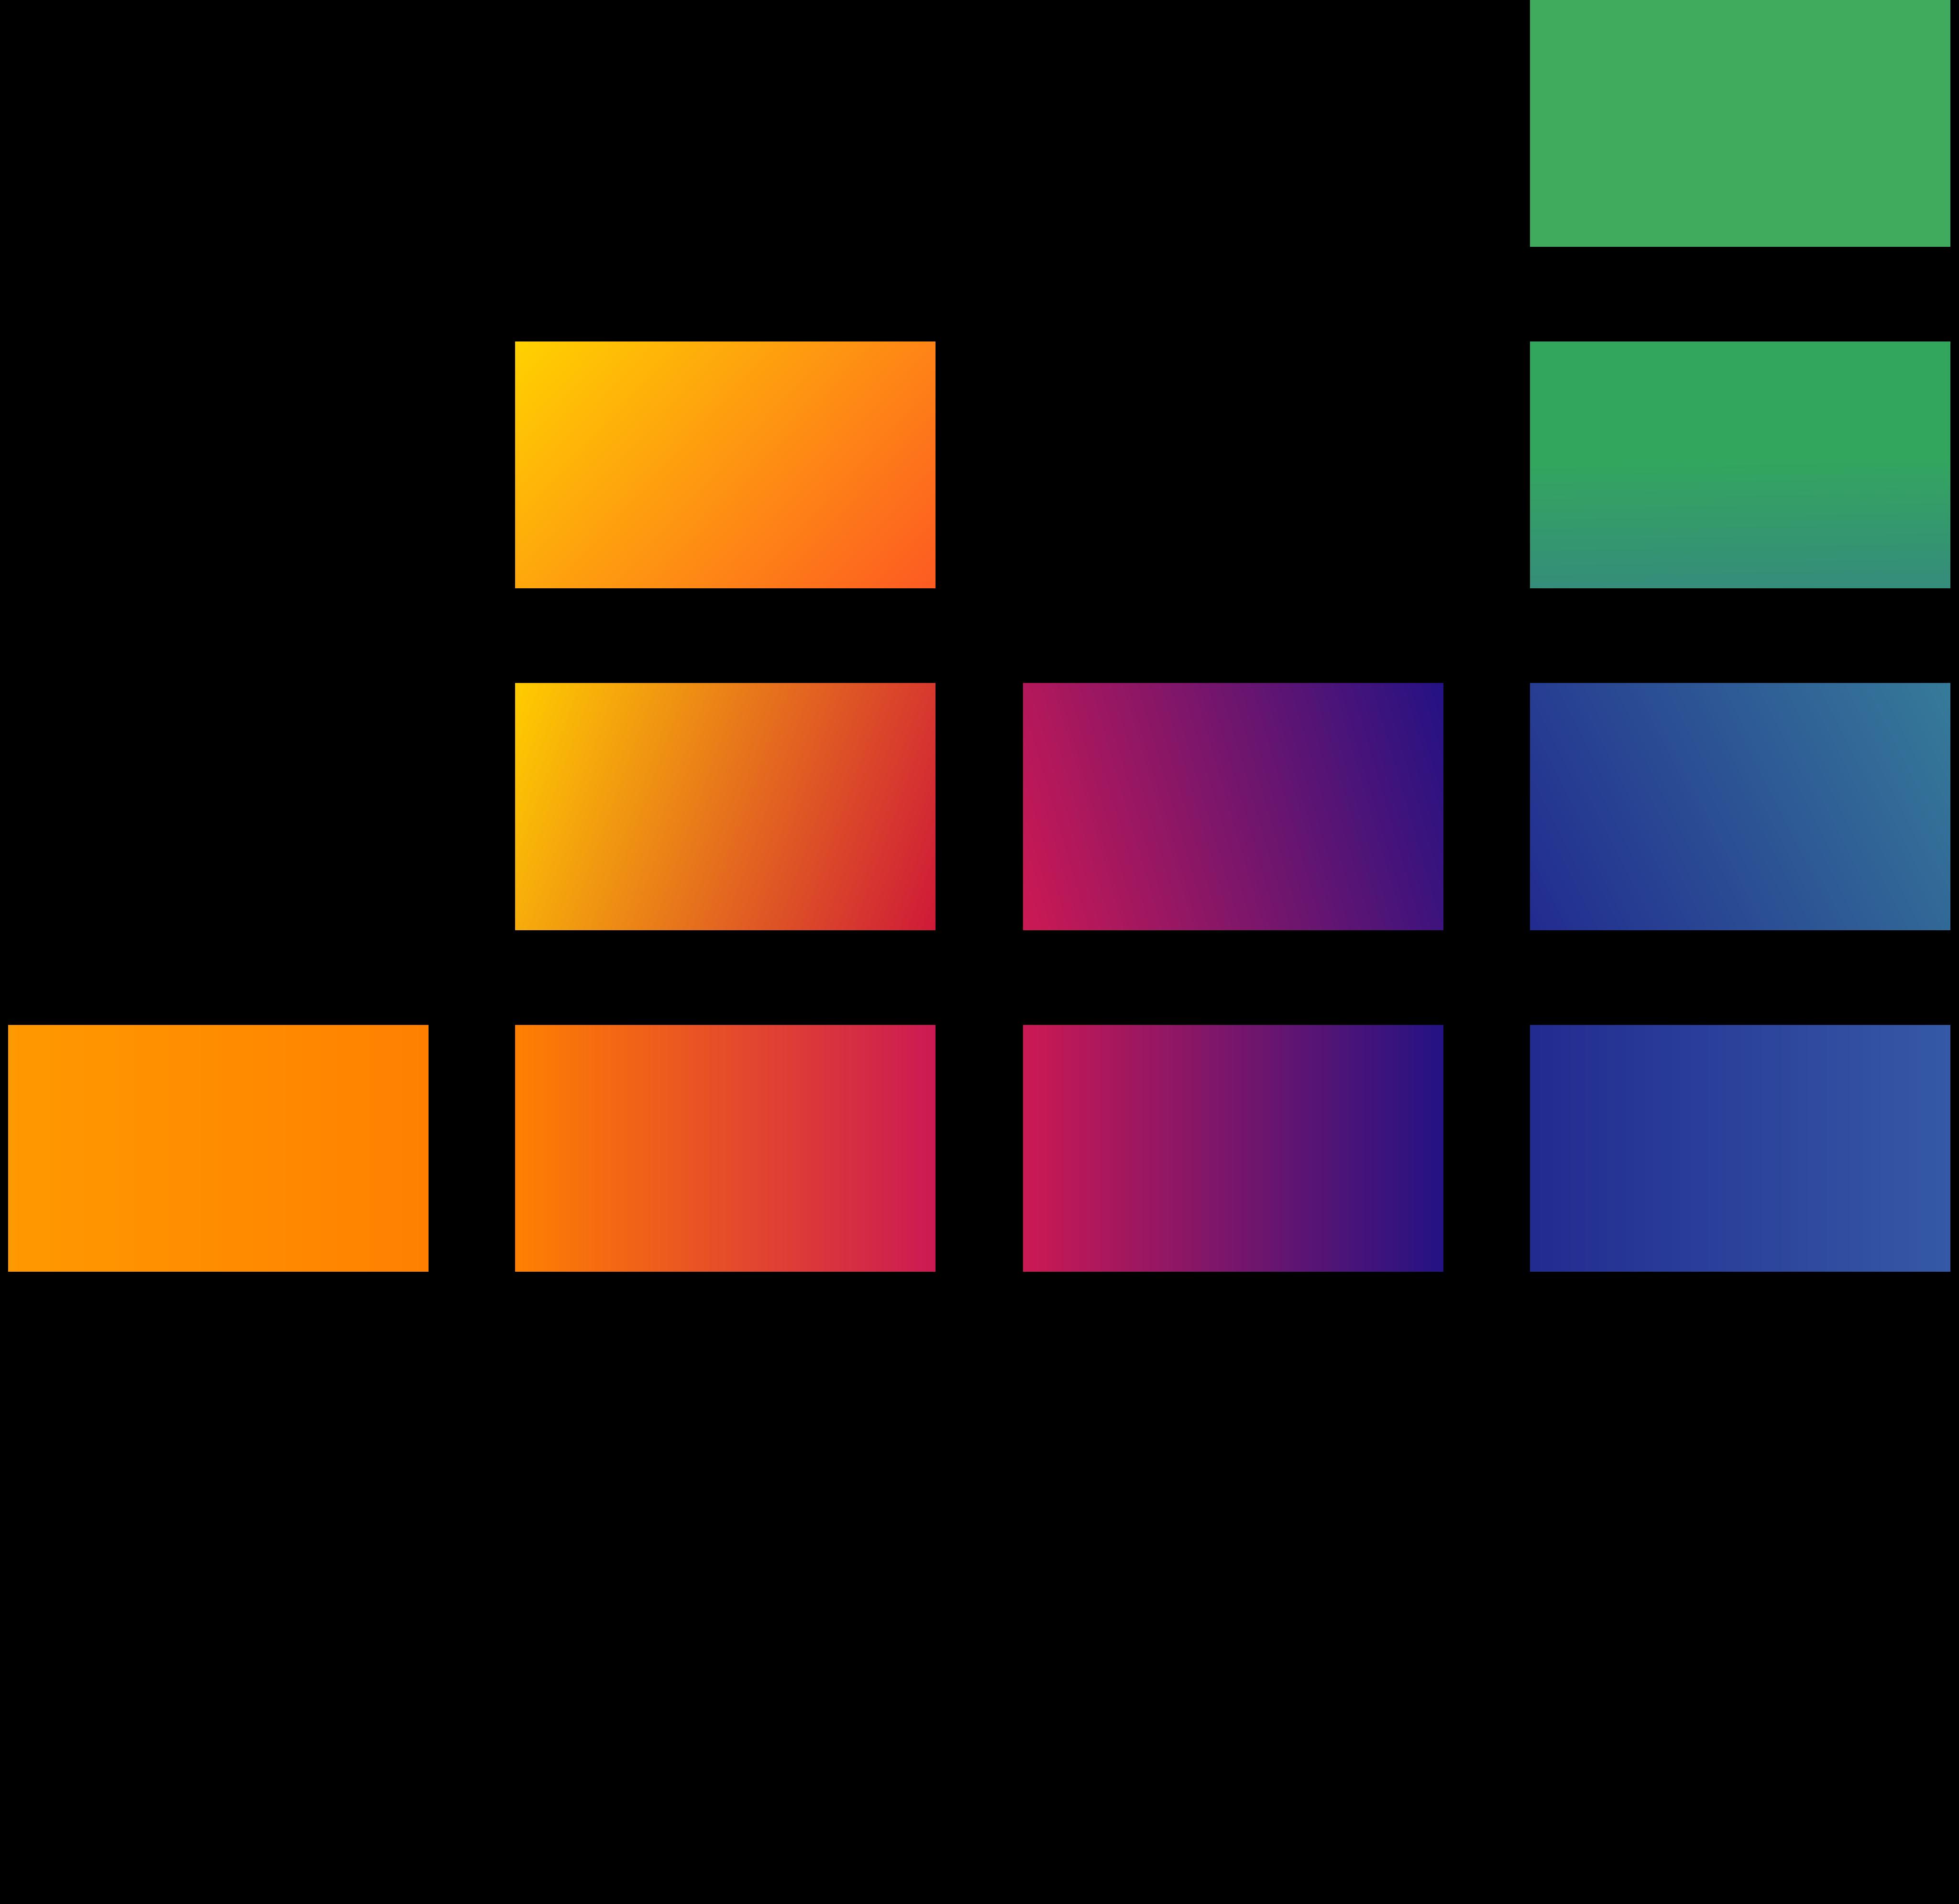 deezer logo 1 1 - Deezer Logo